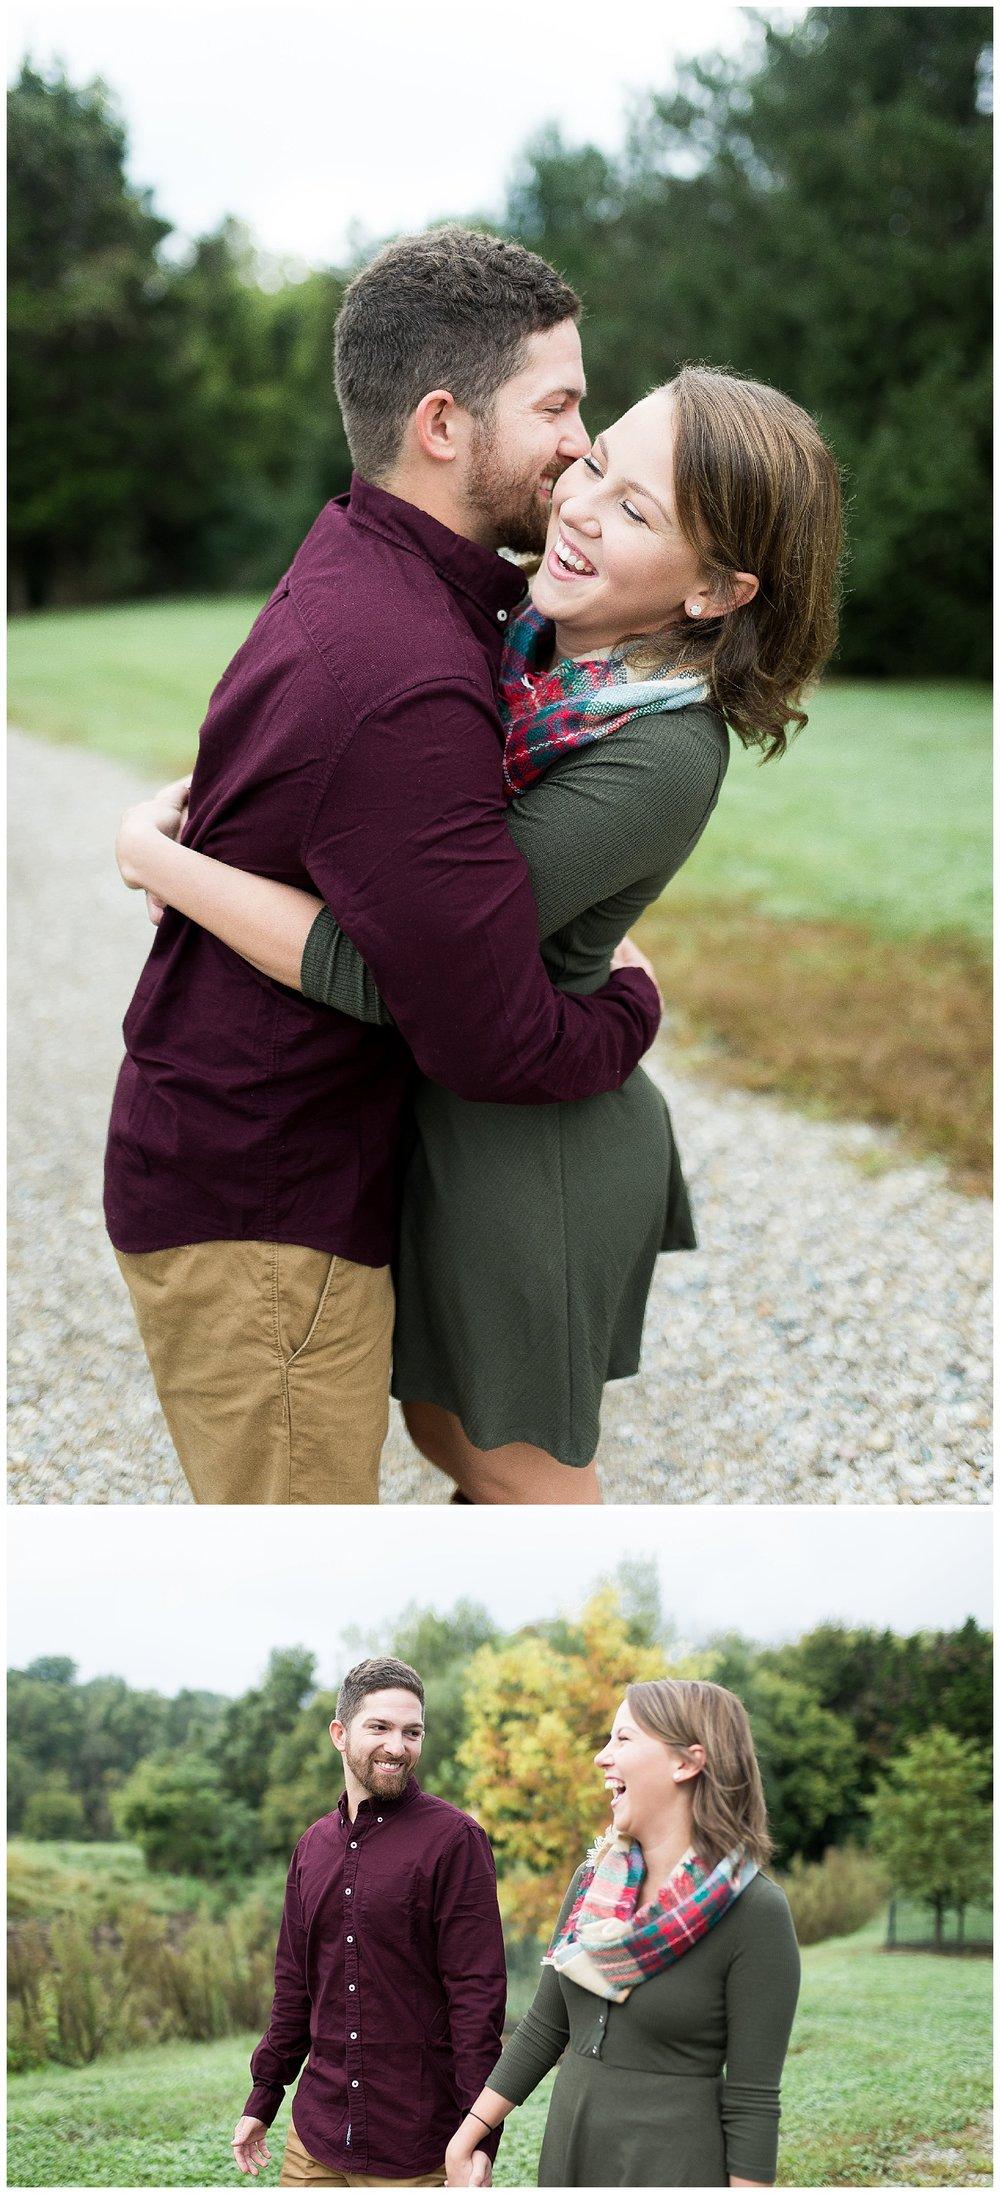 everleigh-photography-cincinnati-wedding-photographer-best-moments-of-2016-cincinnati-wedding-cincinnati-weddings-84